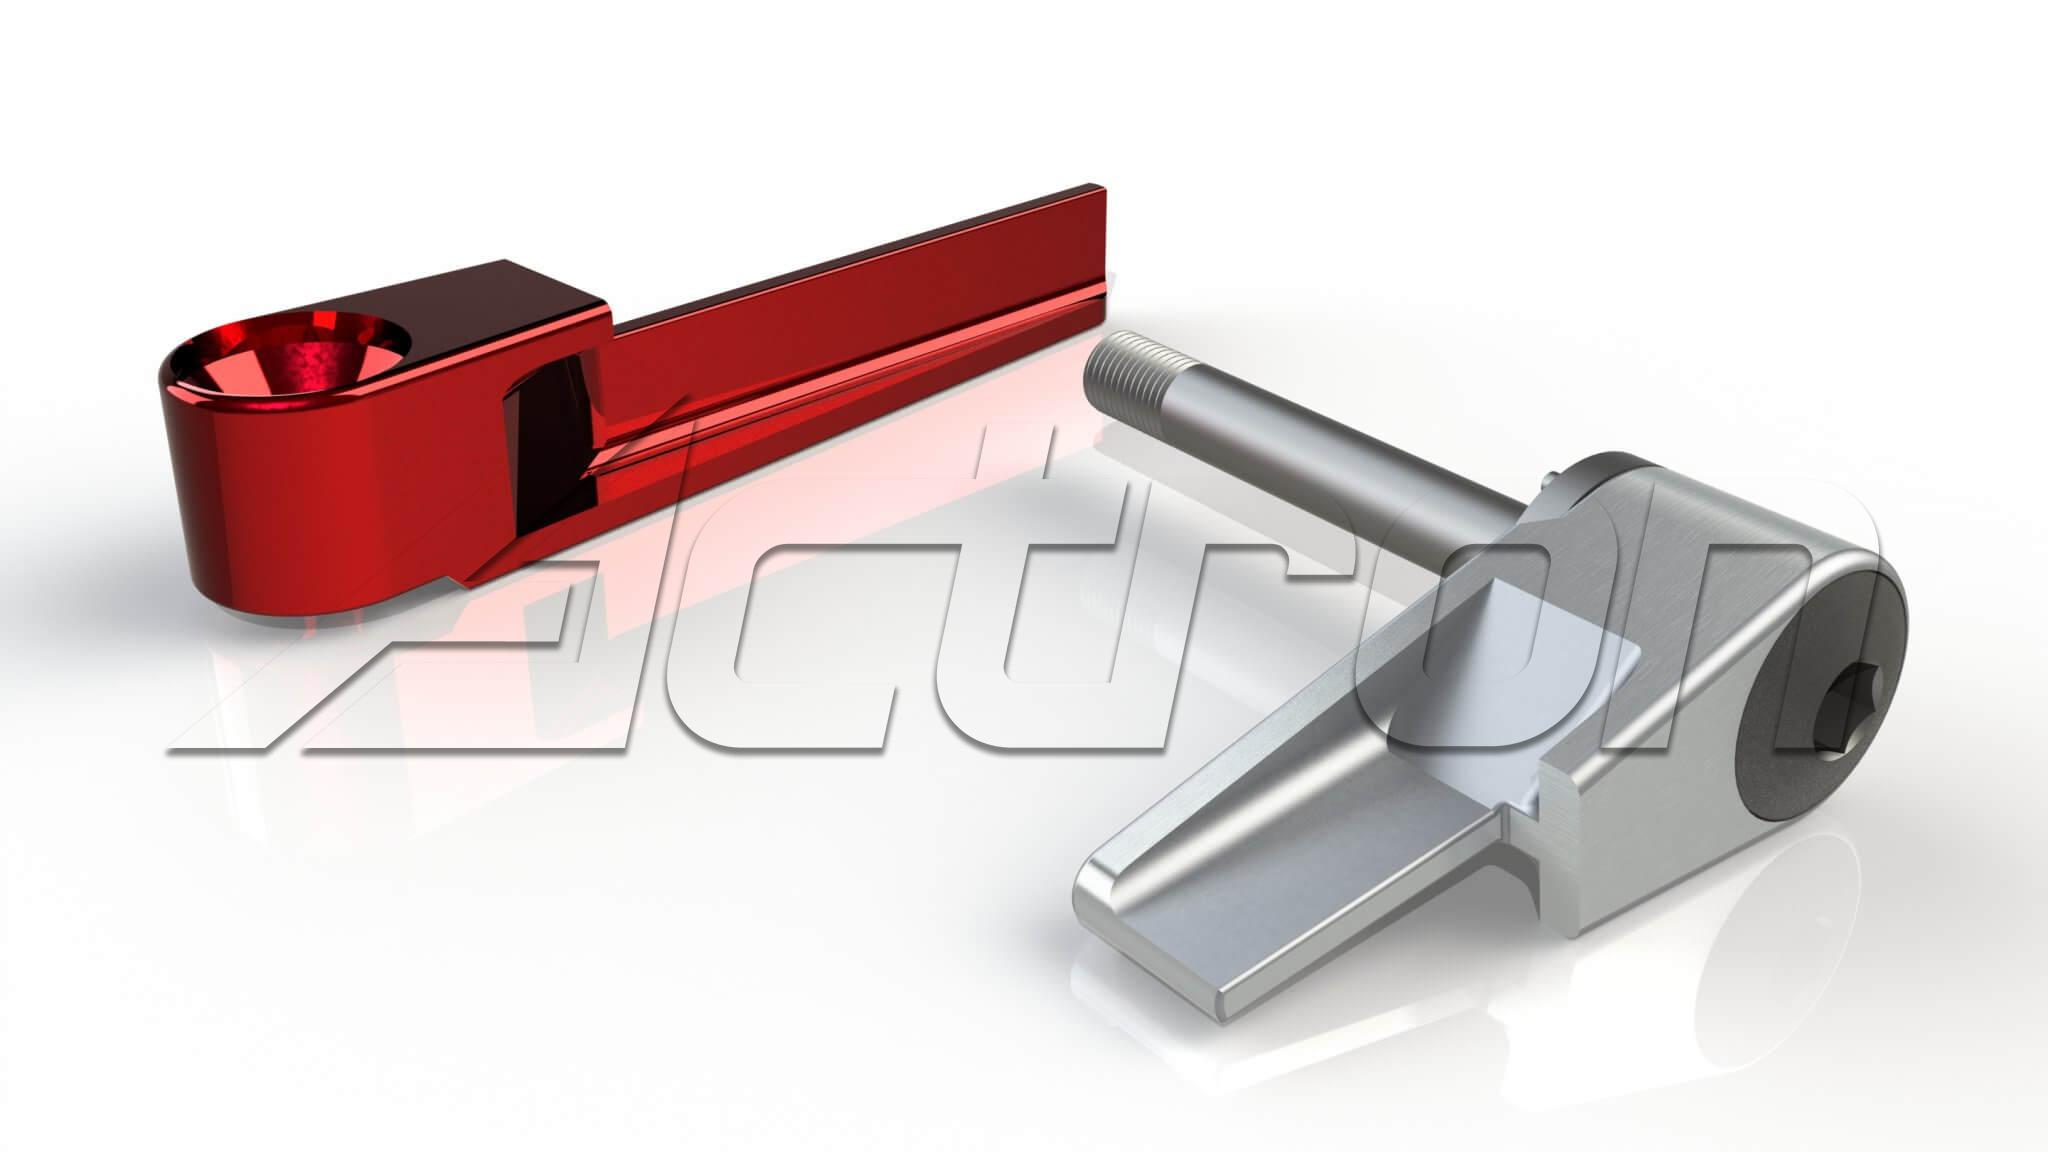 1-4-turn-retainer-4637-a35640.jpg